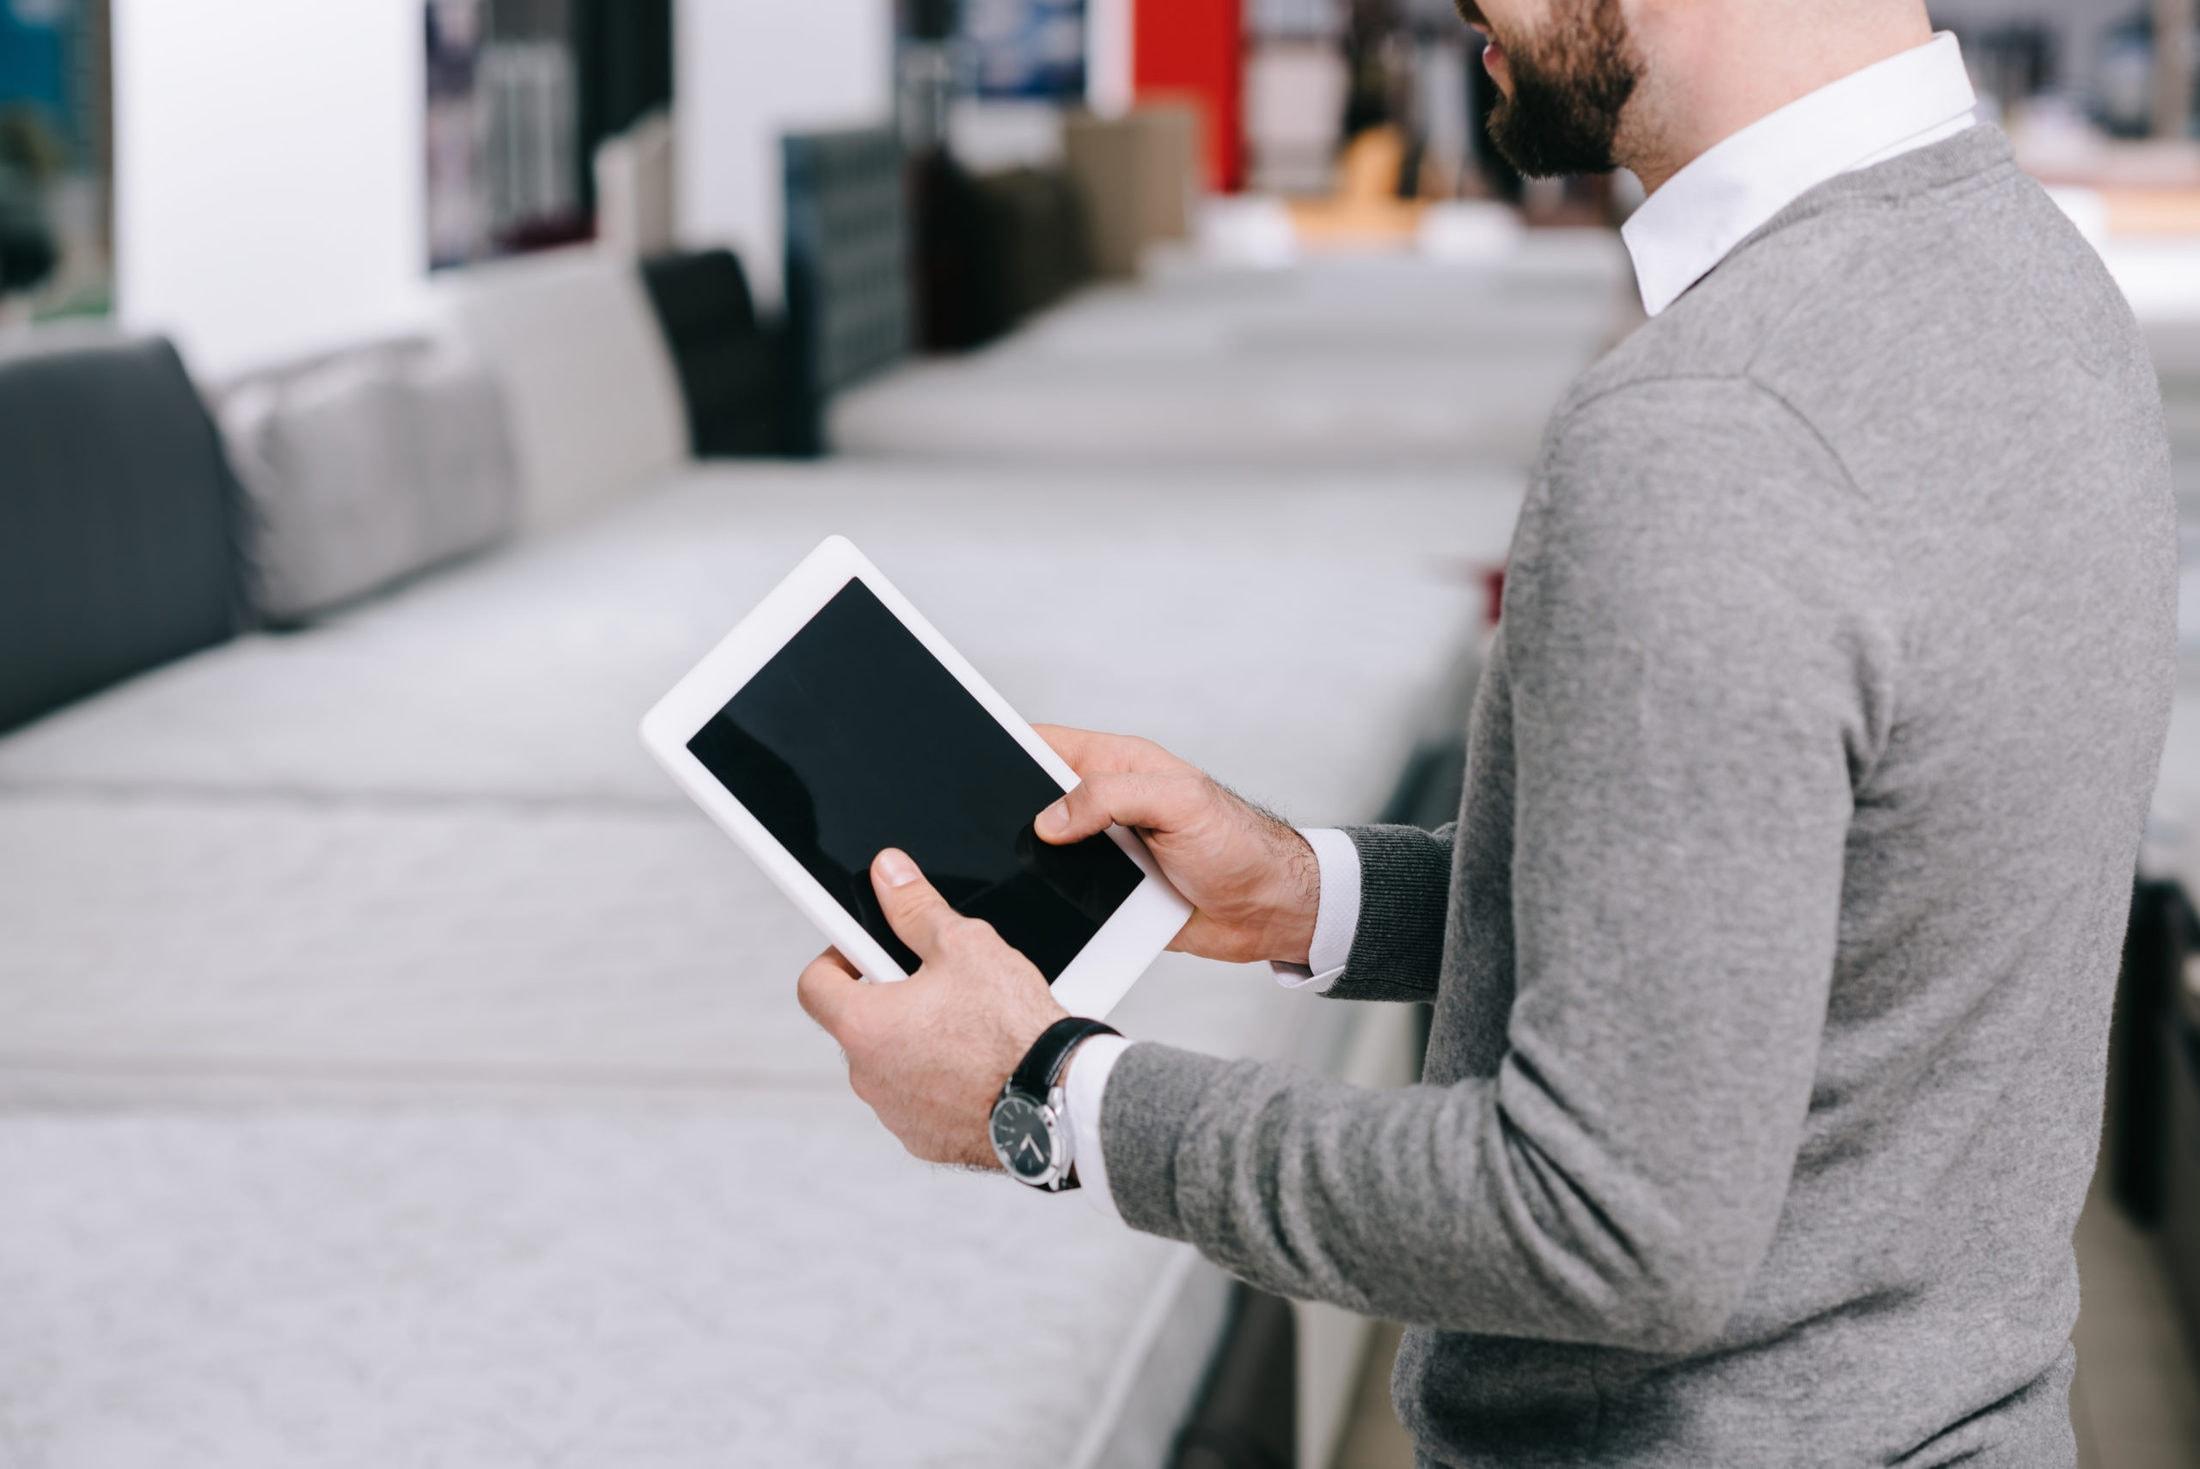 cropped shot of man using digital tablet with blan 7VPGU6U scaled